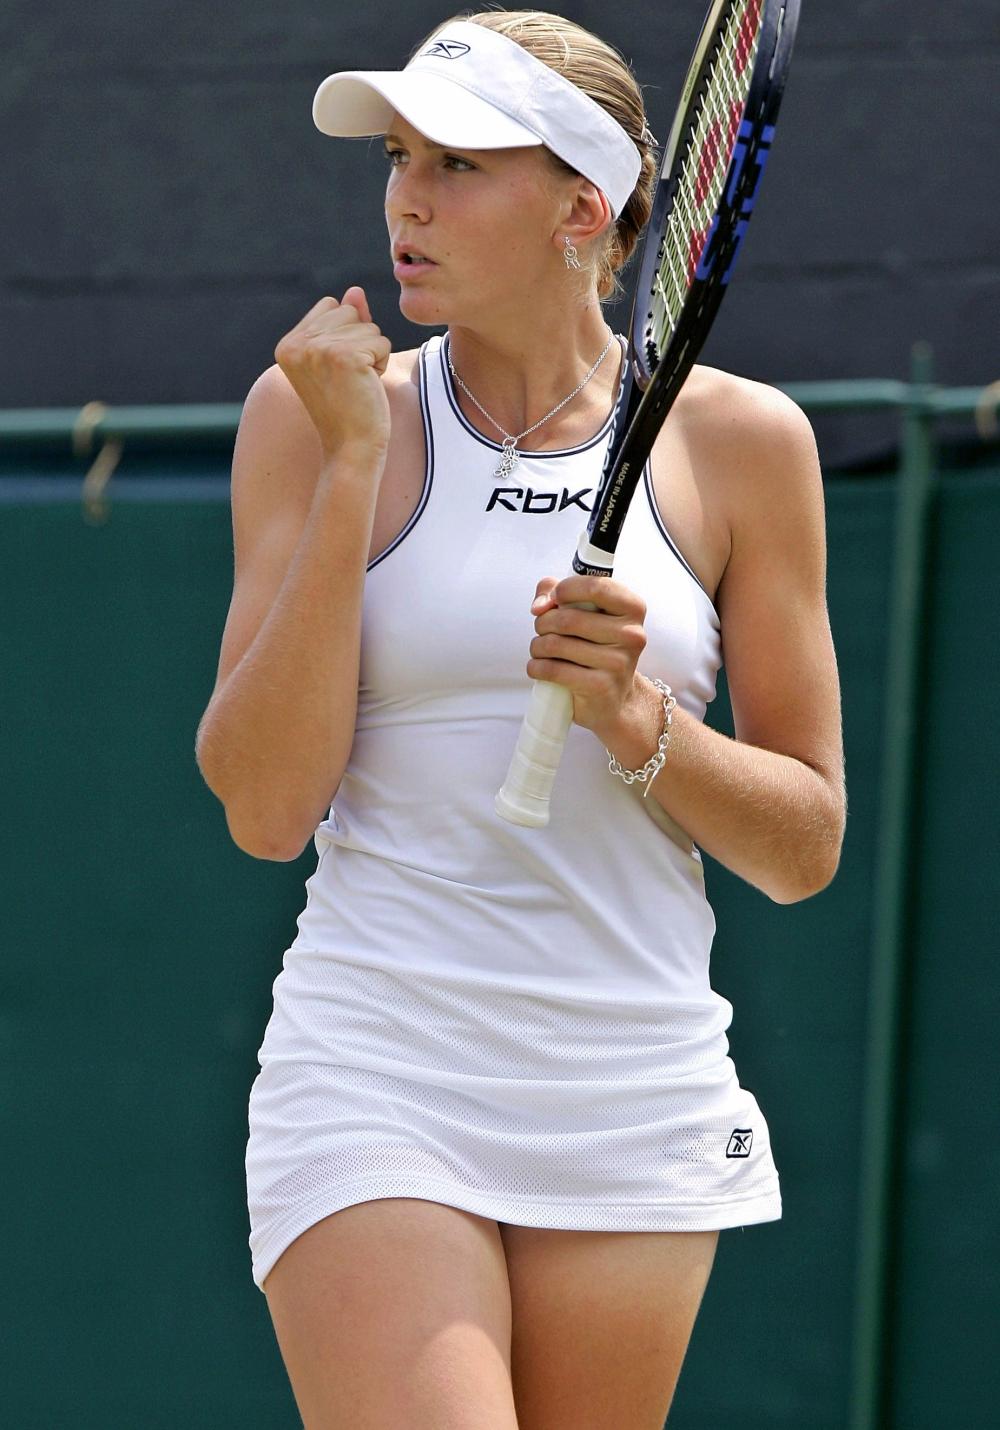 Sexy Tennis Woman 108